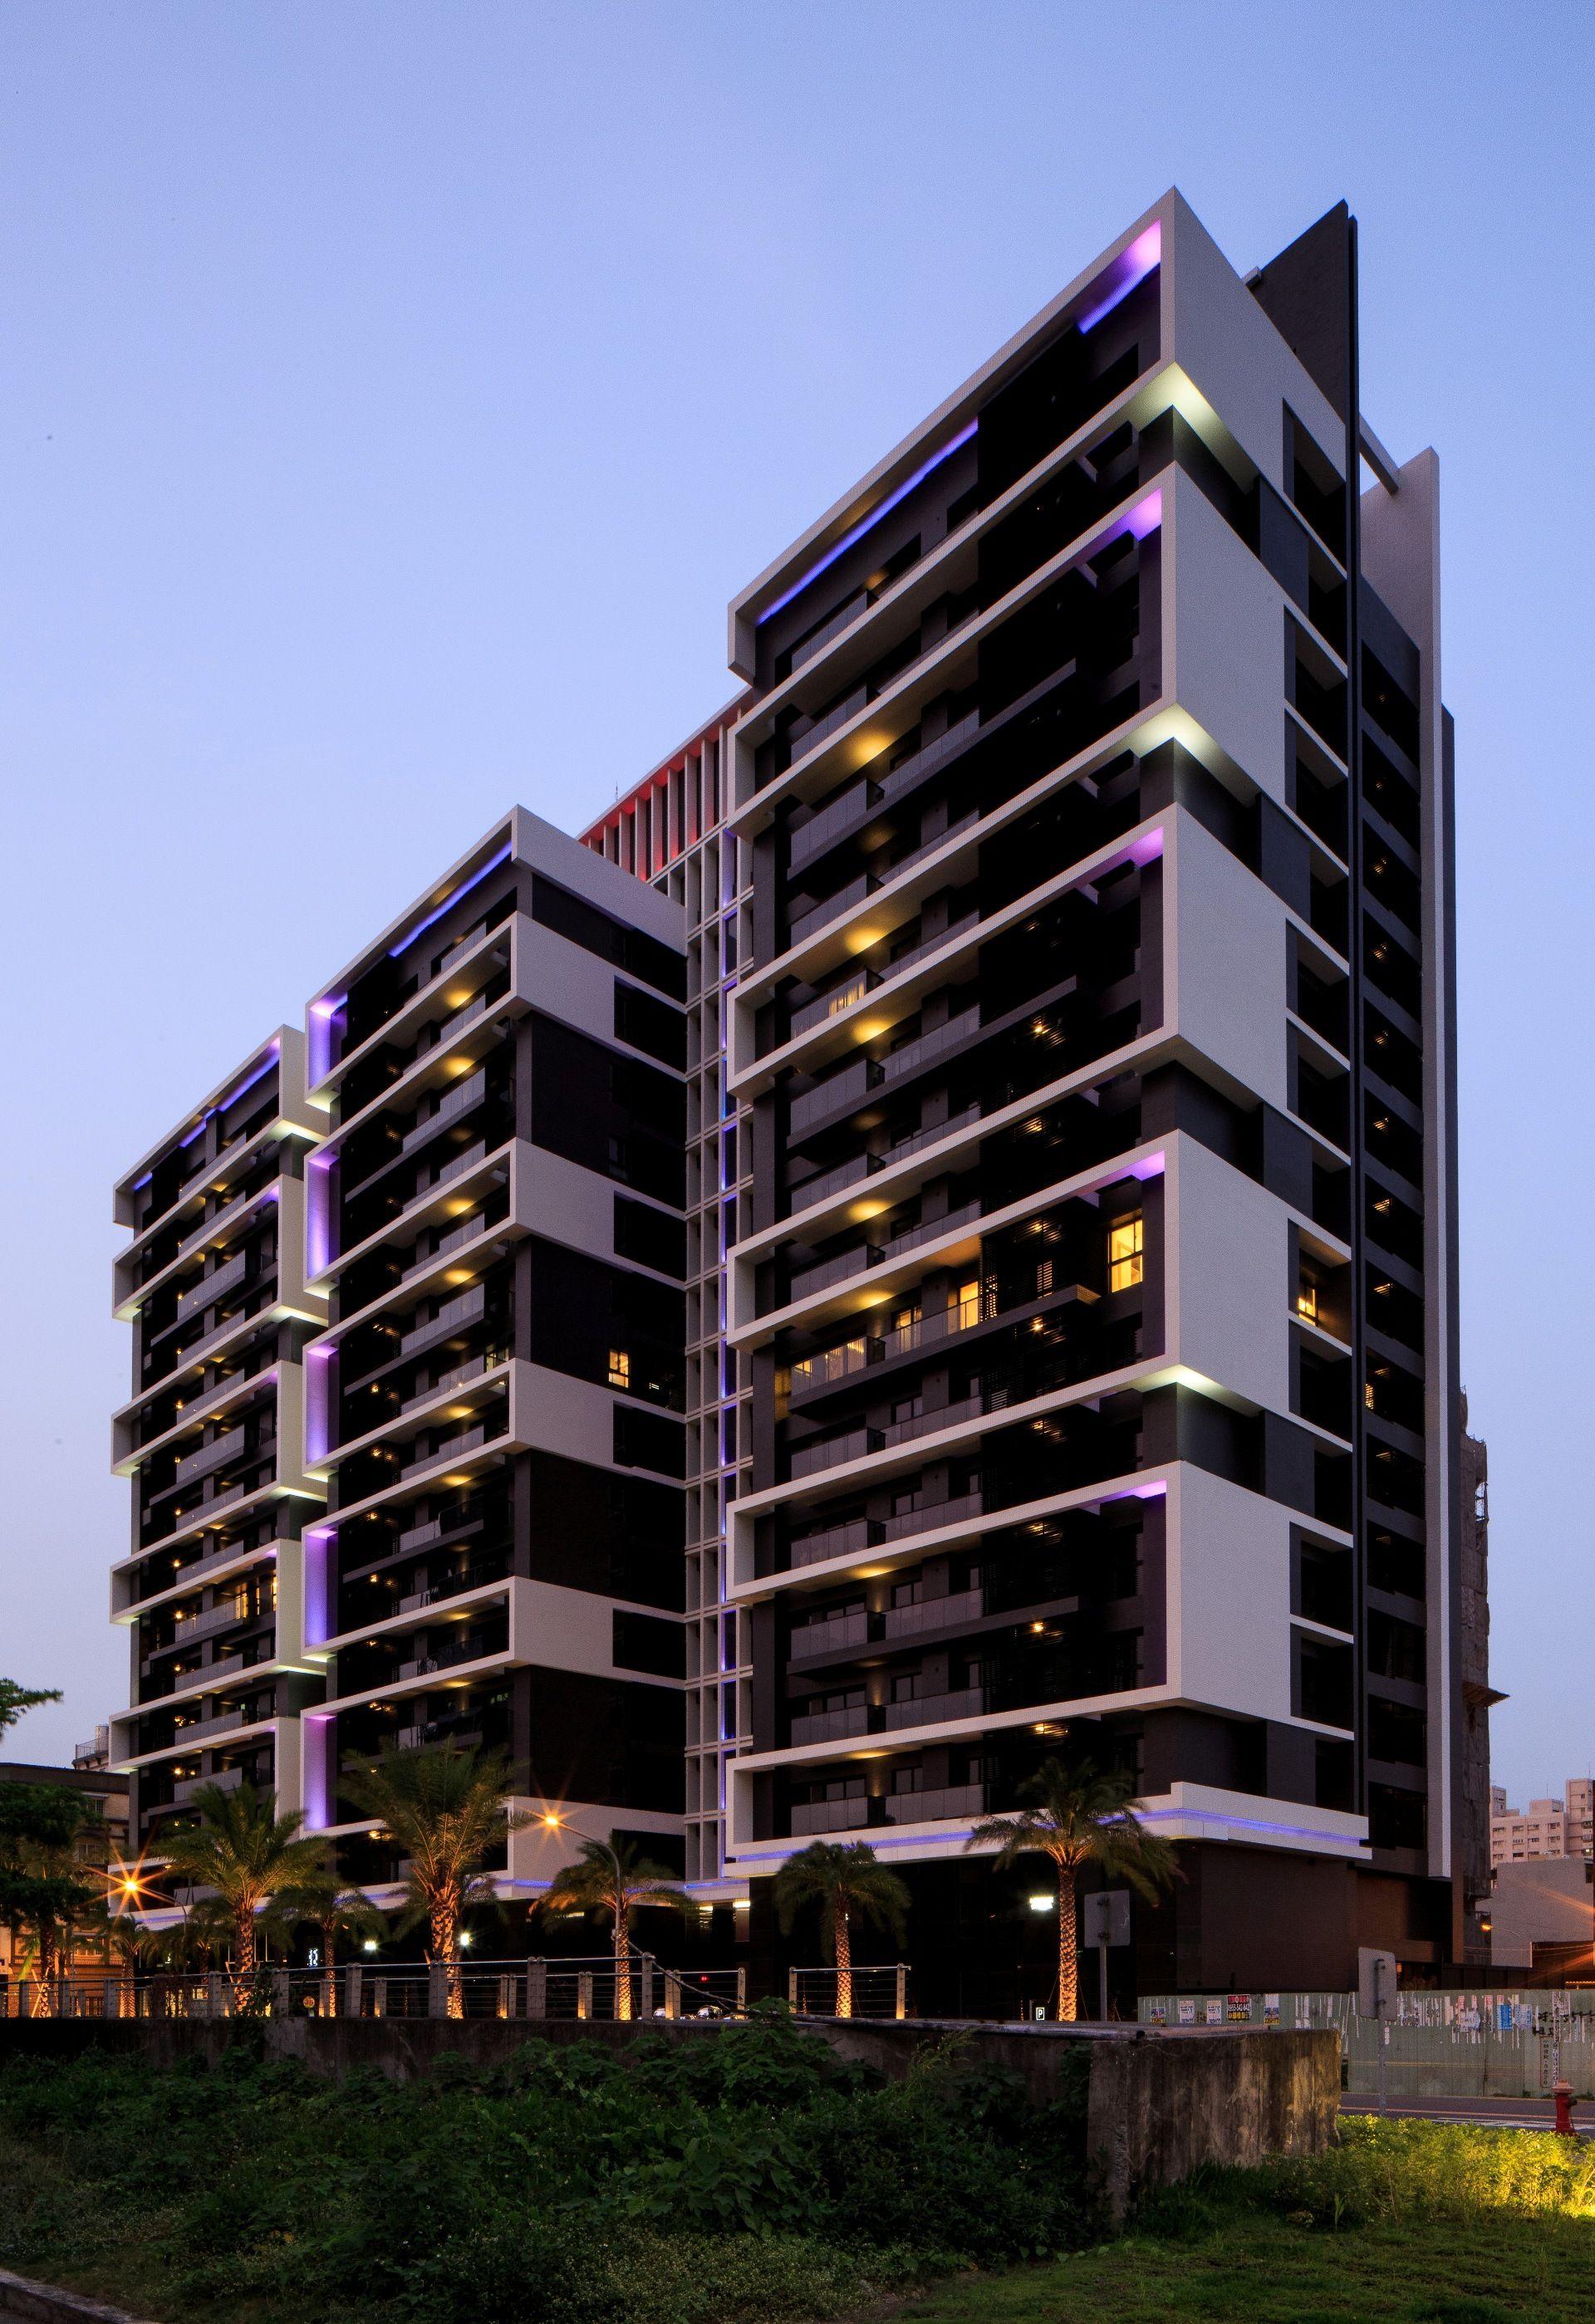 10 072 c d pinterest edificios fachadas y arquitectura for Edificios minimalistas